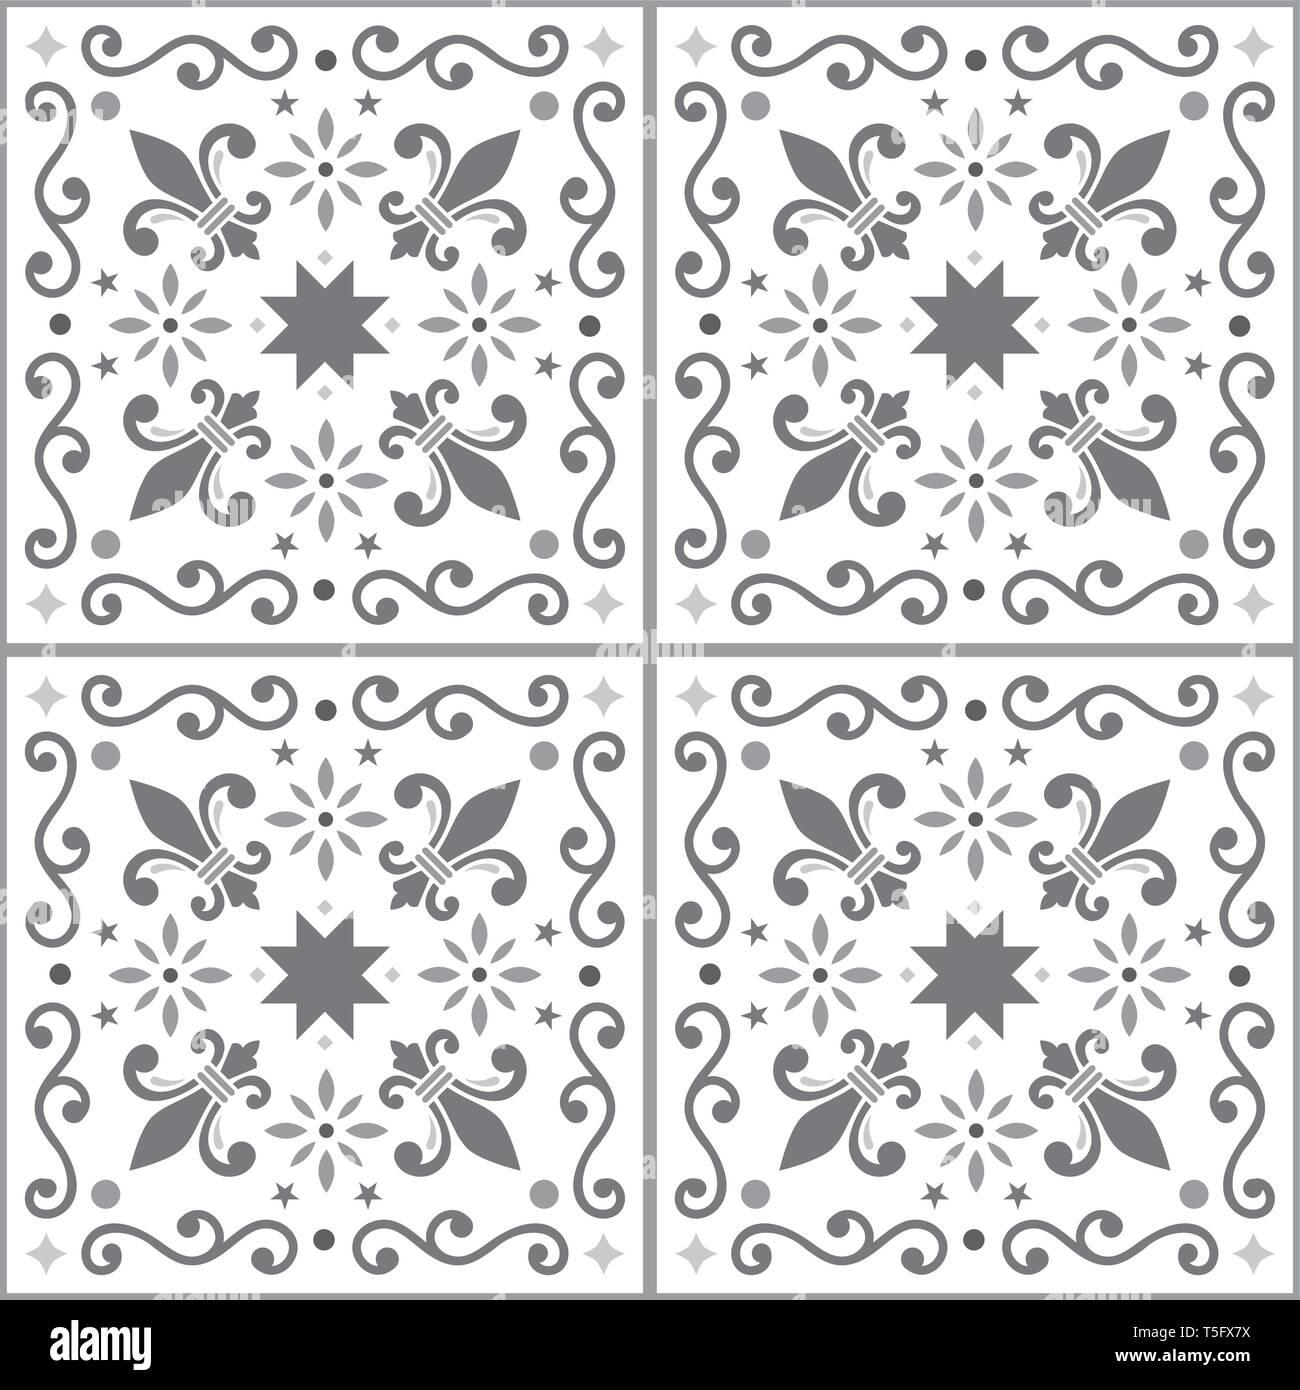 Azulejos seamless vector pattern, gray Portuguese Lisbon tiles design with fleur de lis, flowers and geometric shapes - Stock Vector